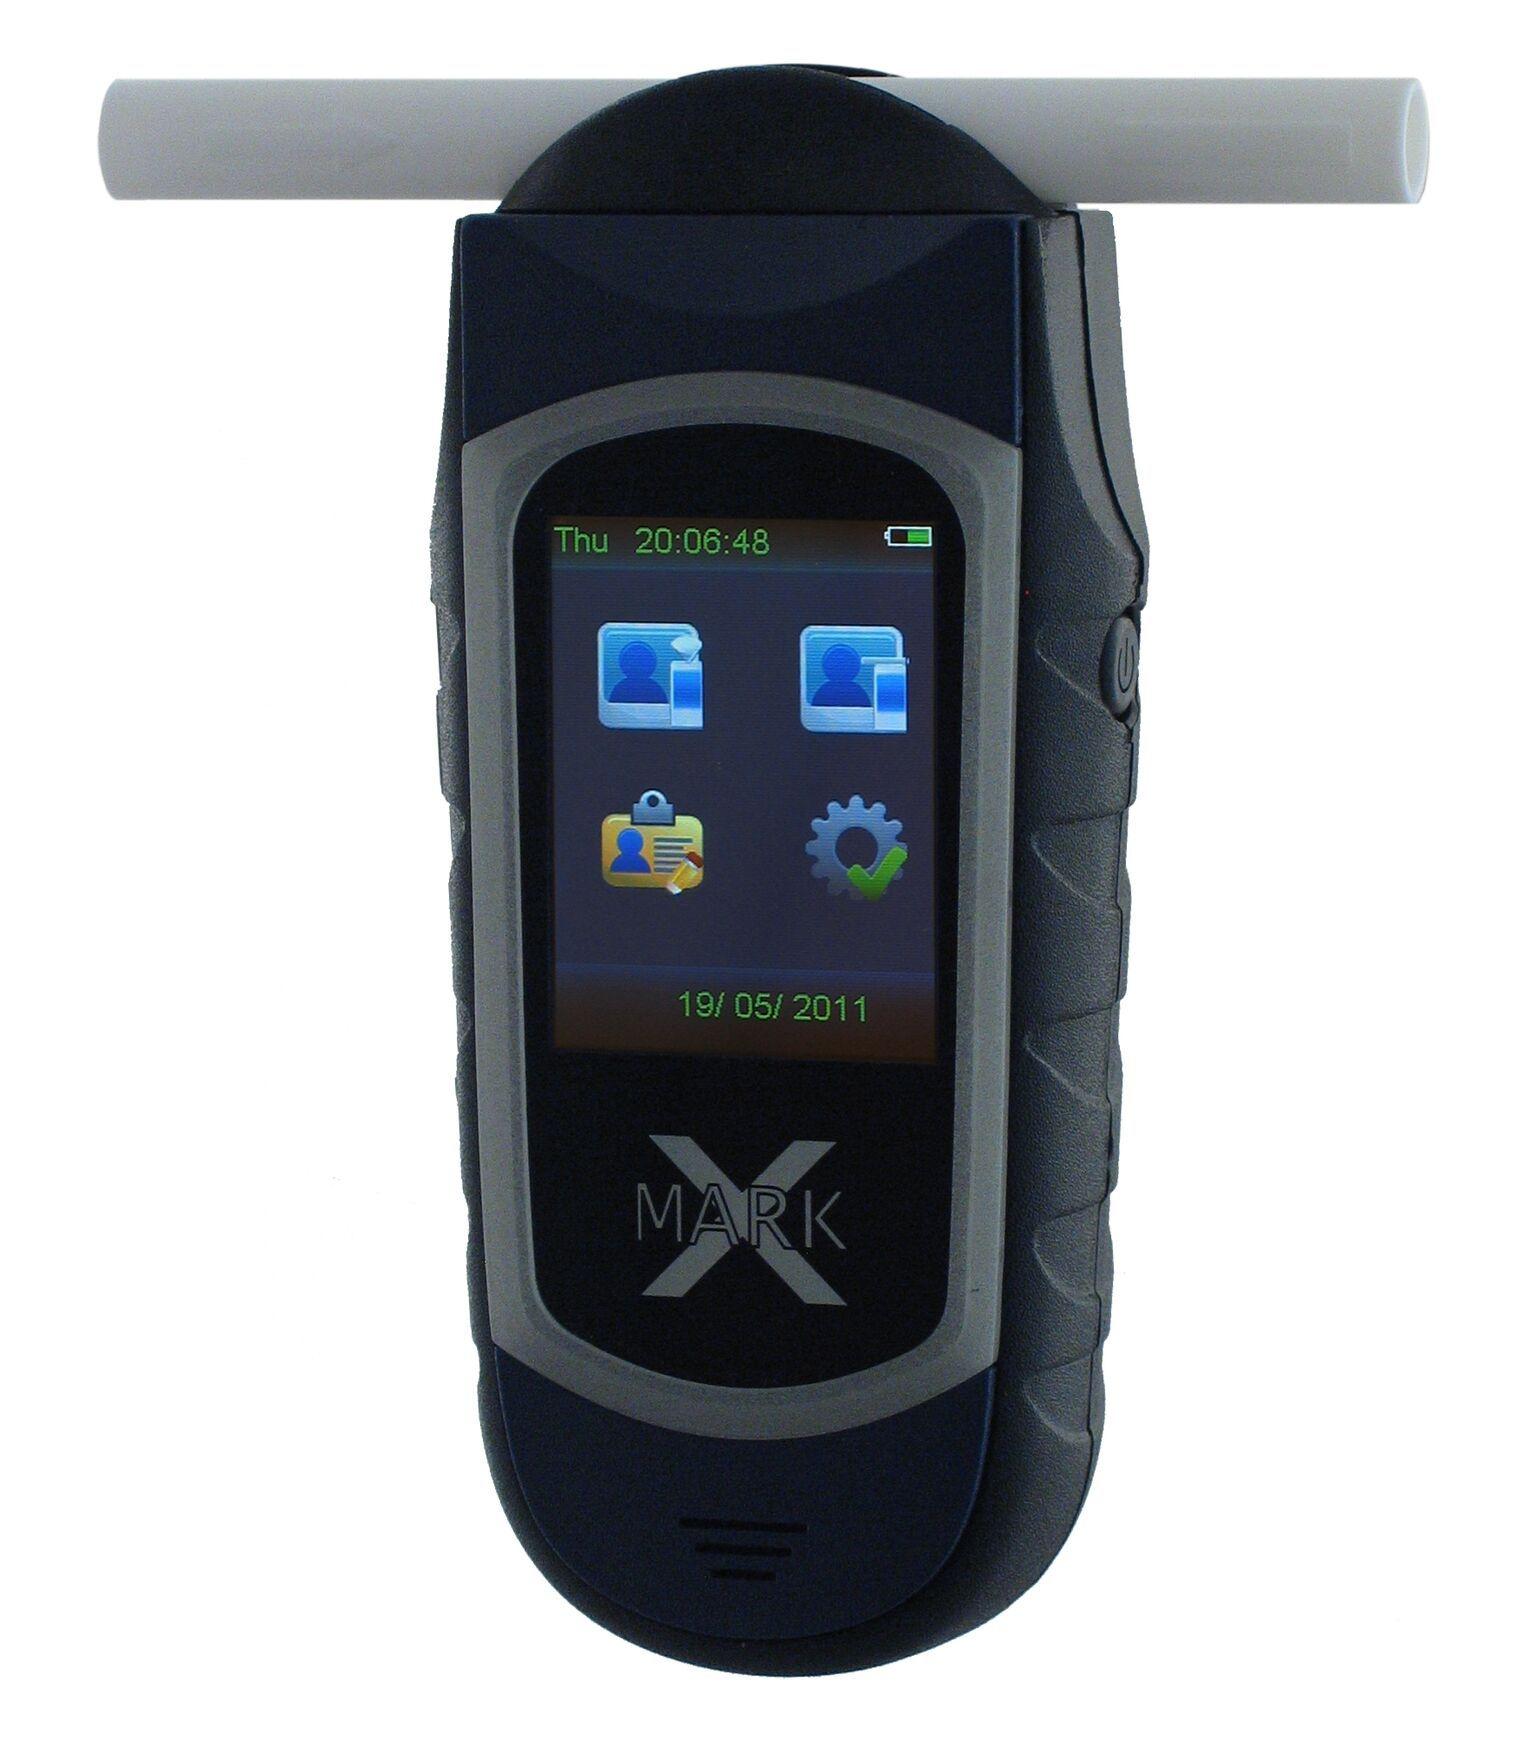 Image of Alkomat alcovisor mark xp blue